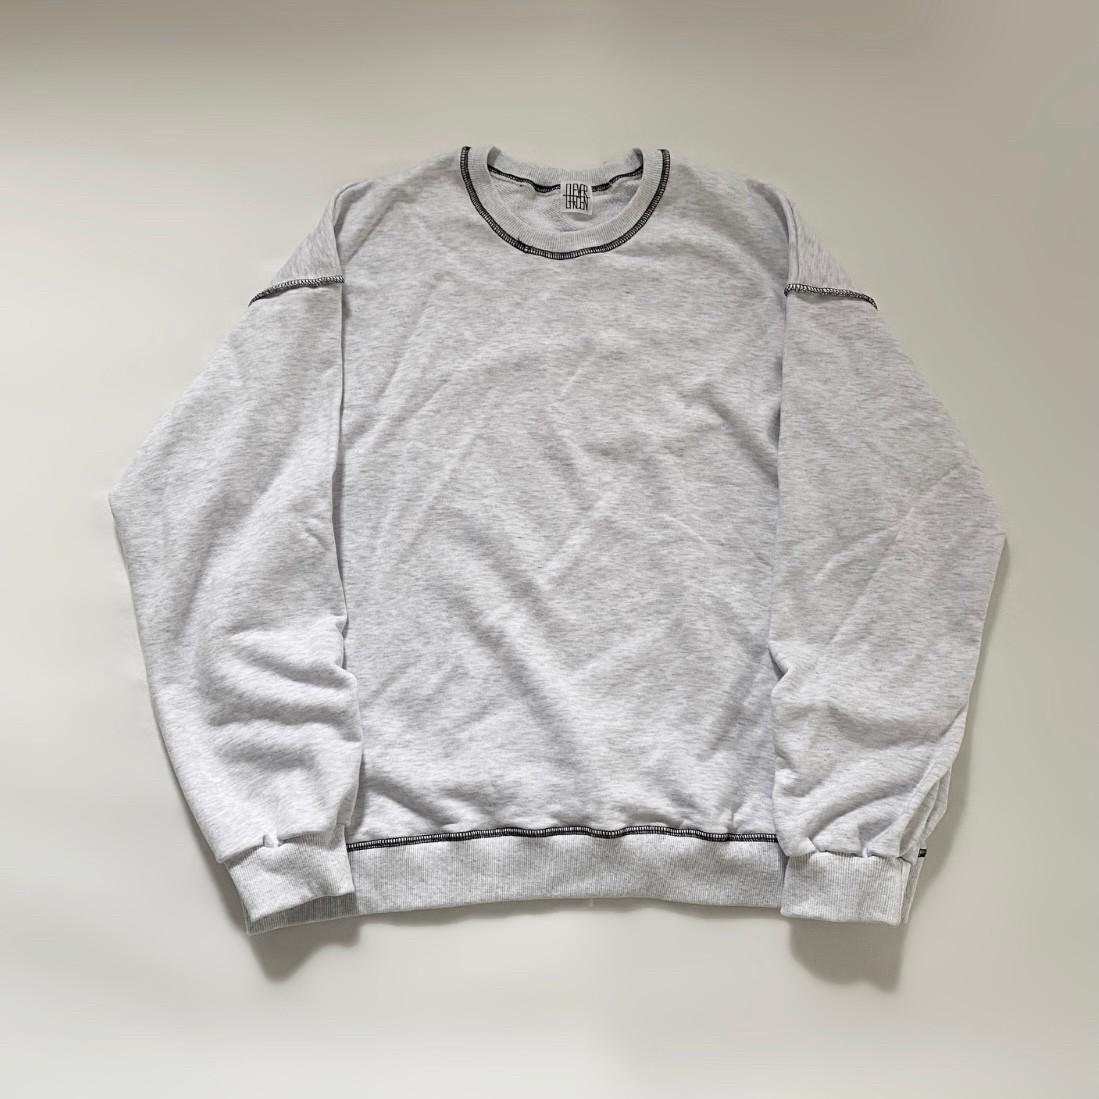 stitch work sweat shirt